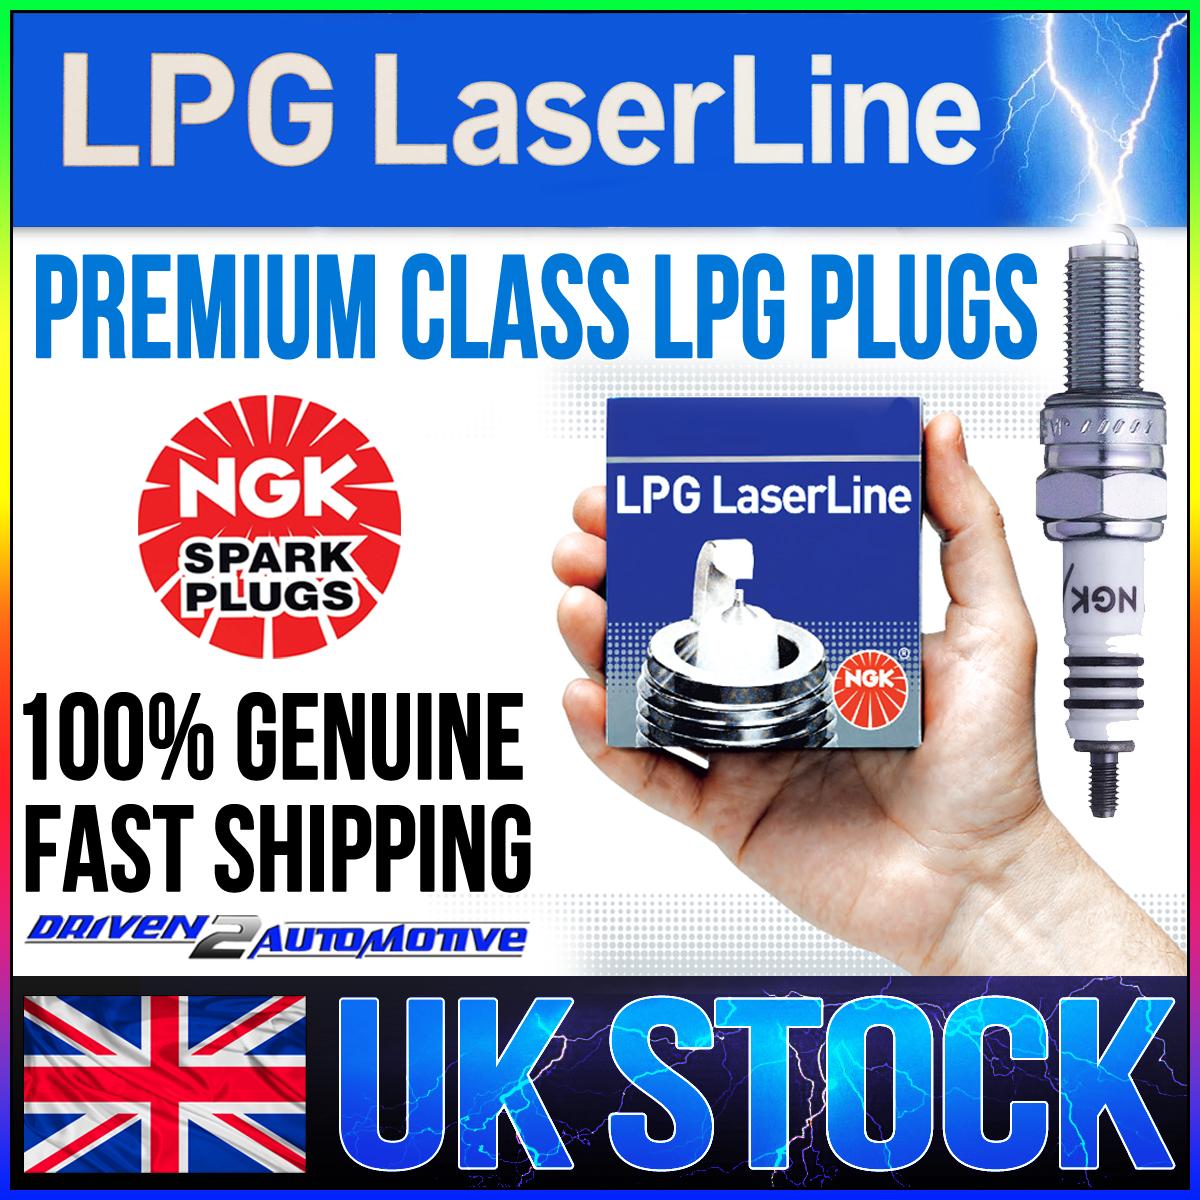 NEW-NGK-IRIDIUM-IX-PLATINUM-LPG-SPARK-PLUGS-FAST-SHIPPING-WORLDWIDE-SALE